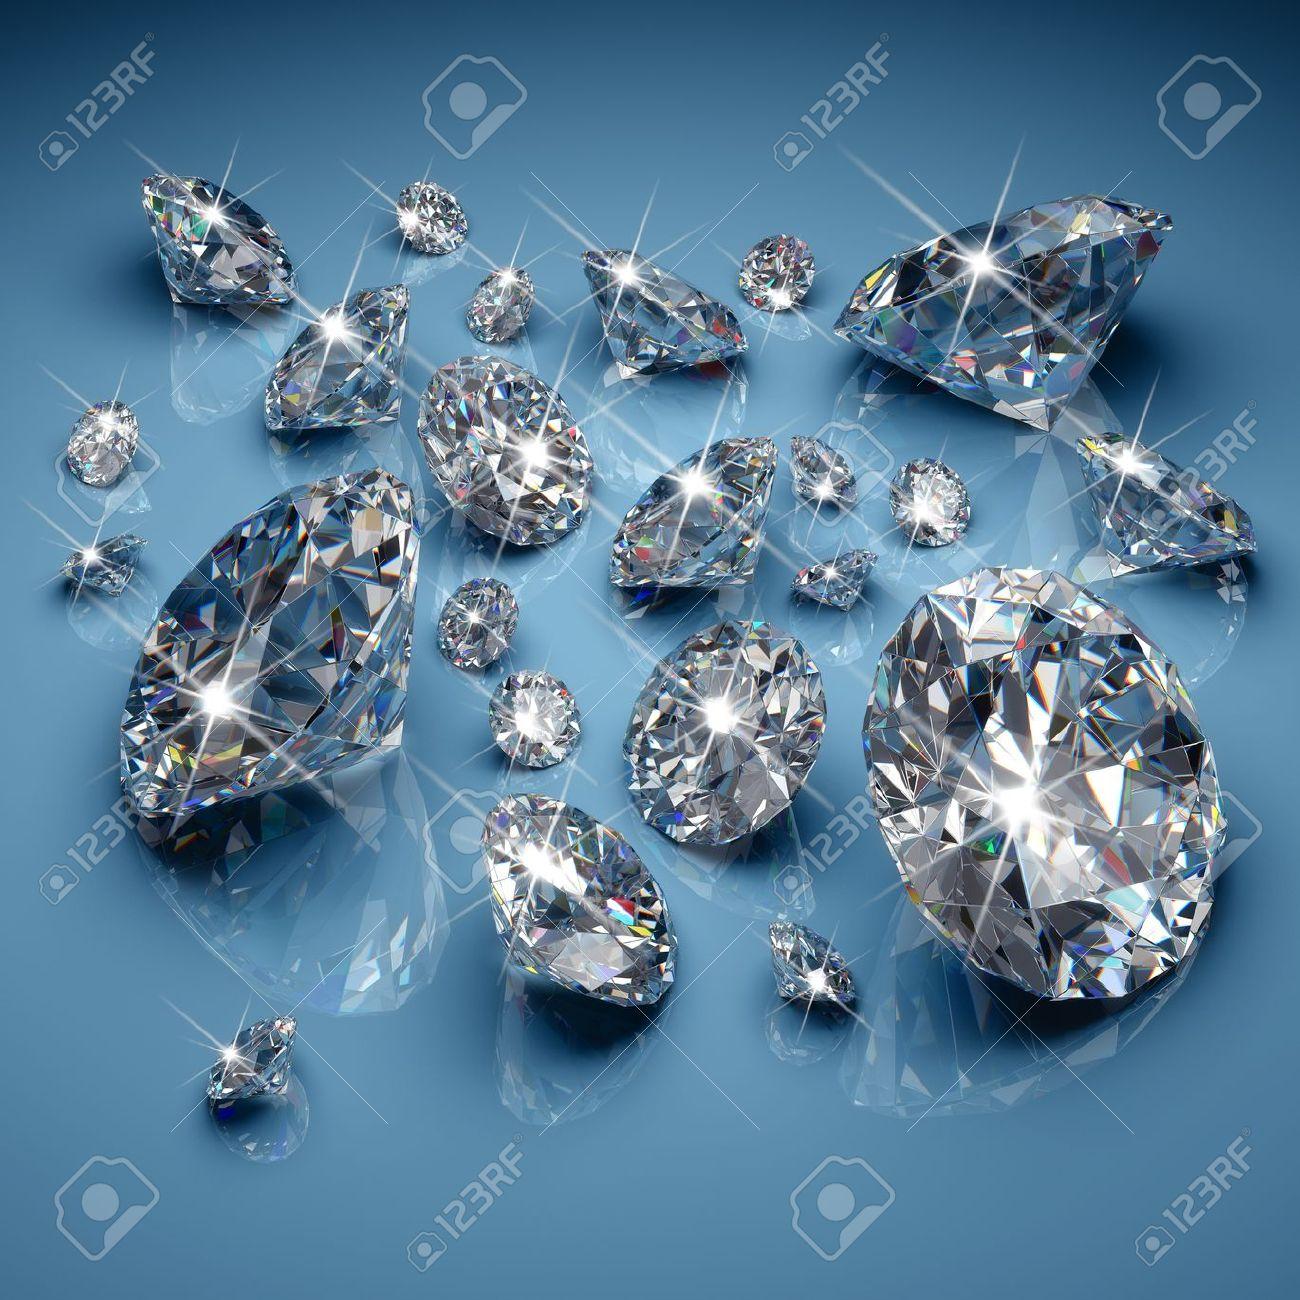 Brilliant diamonds on blue background - 19867136